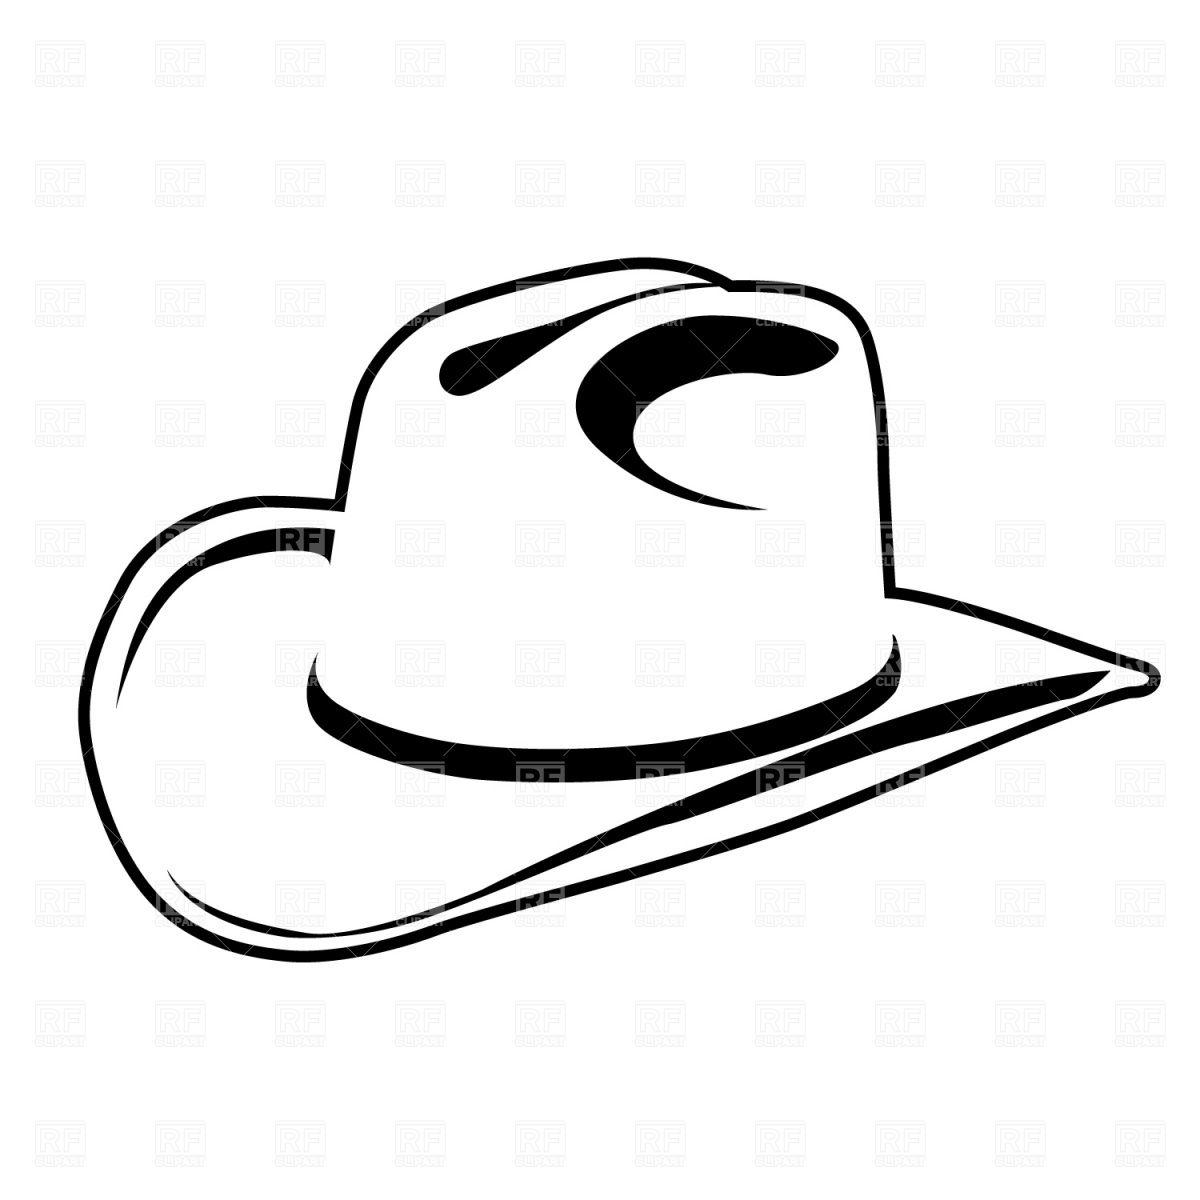 150 X 150 Cowboy Hats Clip Art Black And White Cowboy Hat Drawing